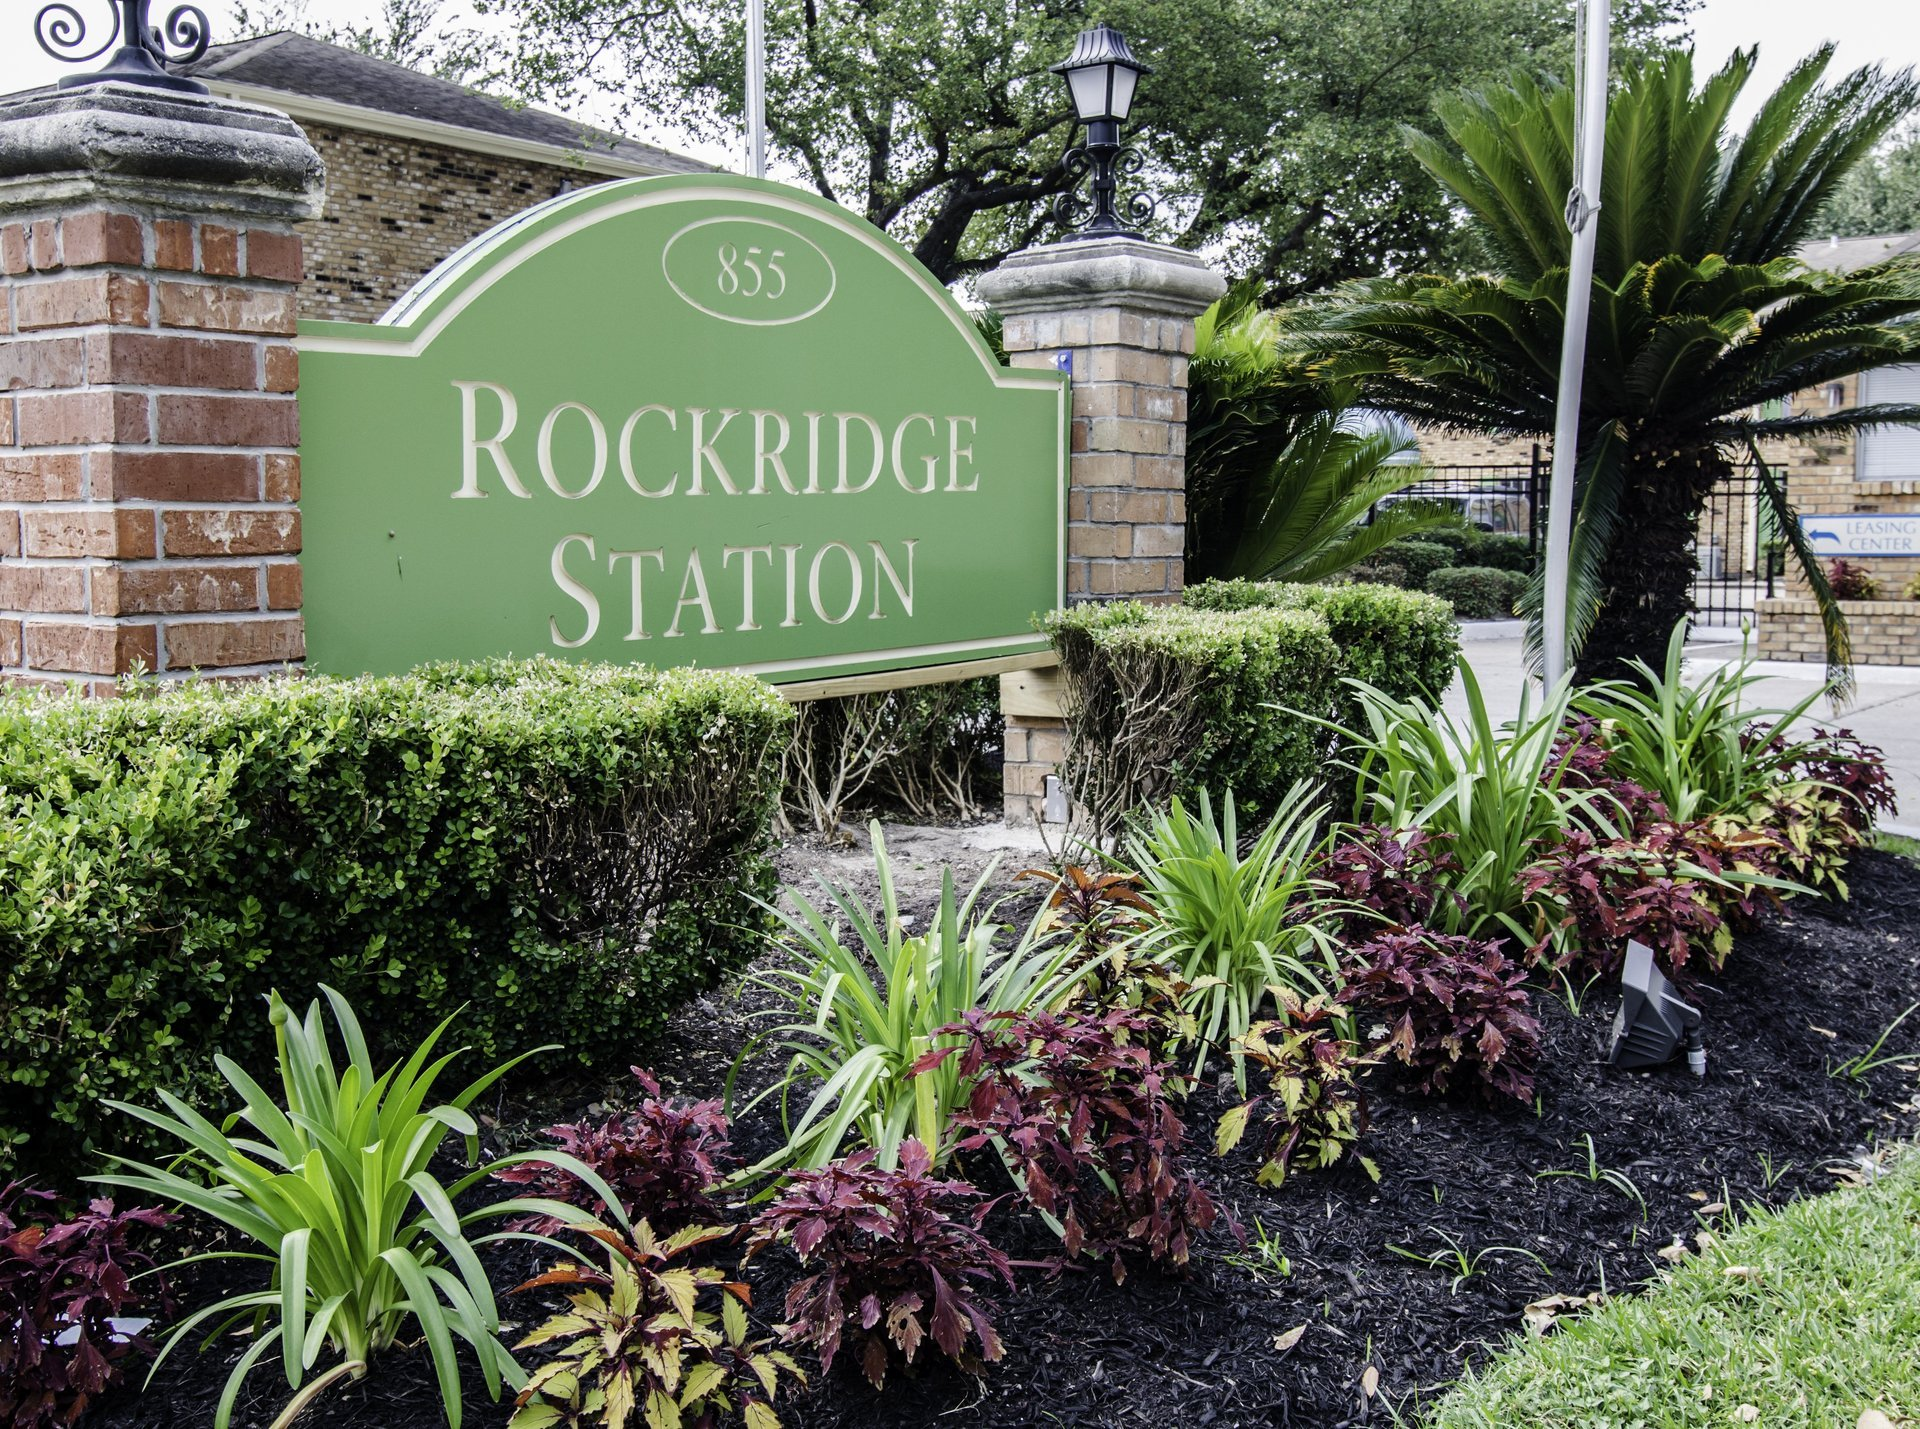 Rockridge Station